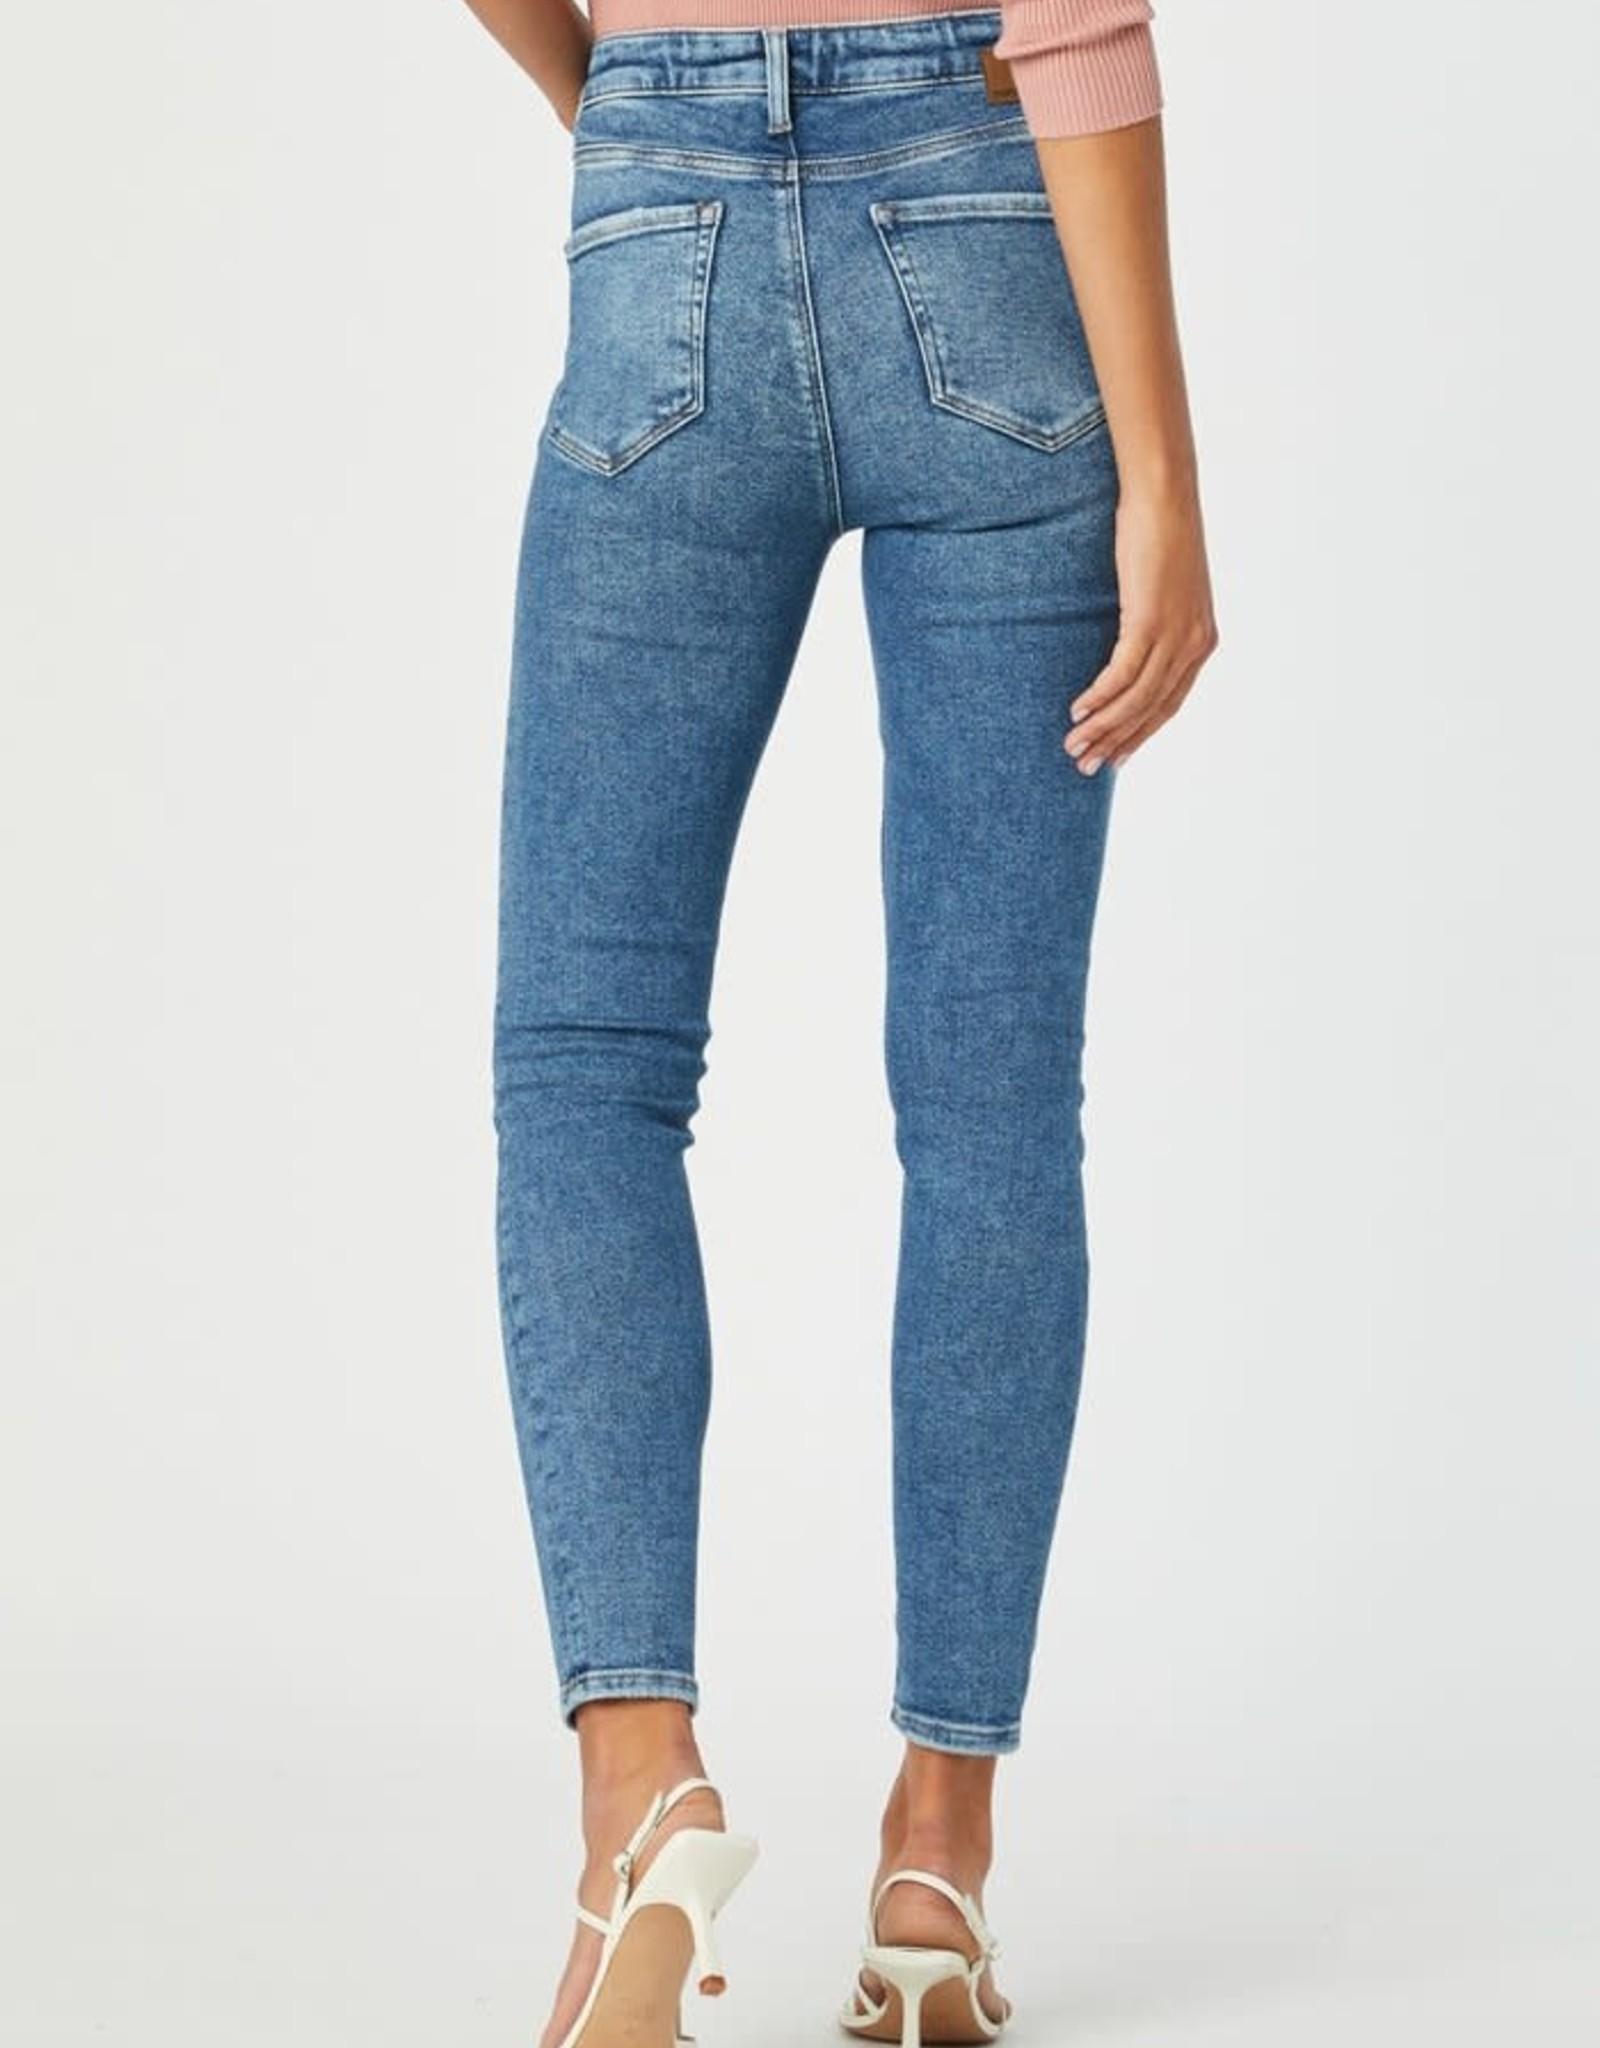 MAVI Jeans SCARLETT Ripped, mid la vintage